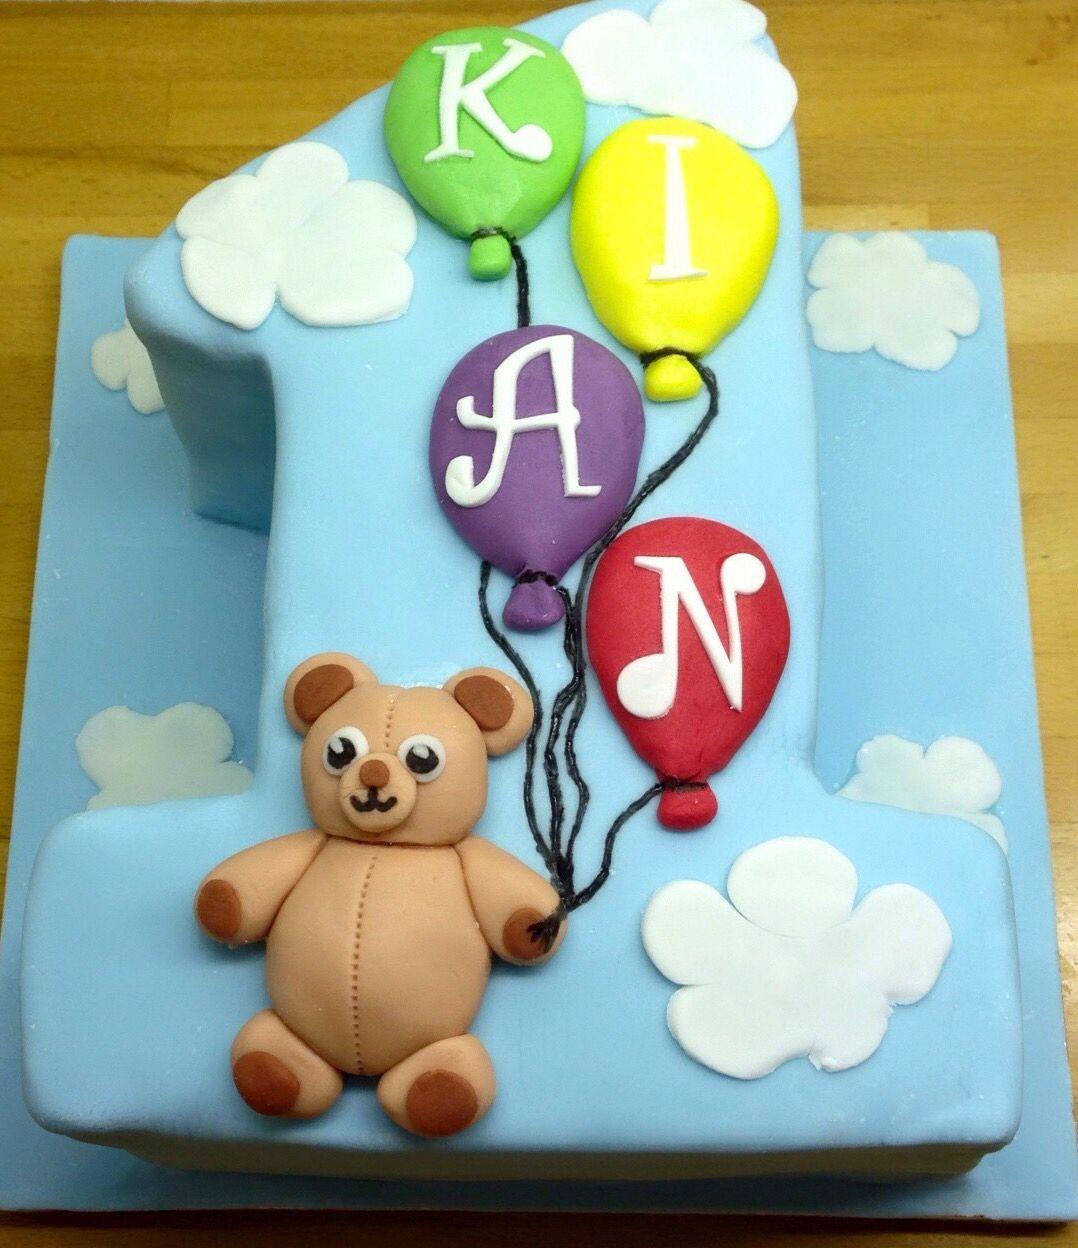 Phenomenal 1 Year Old Baby Boy Cake Ideas The Cake Boutique Funny Birthday Cards Online Inifodamsfinfo